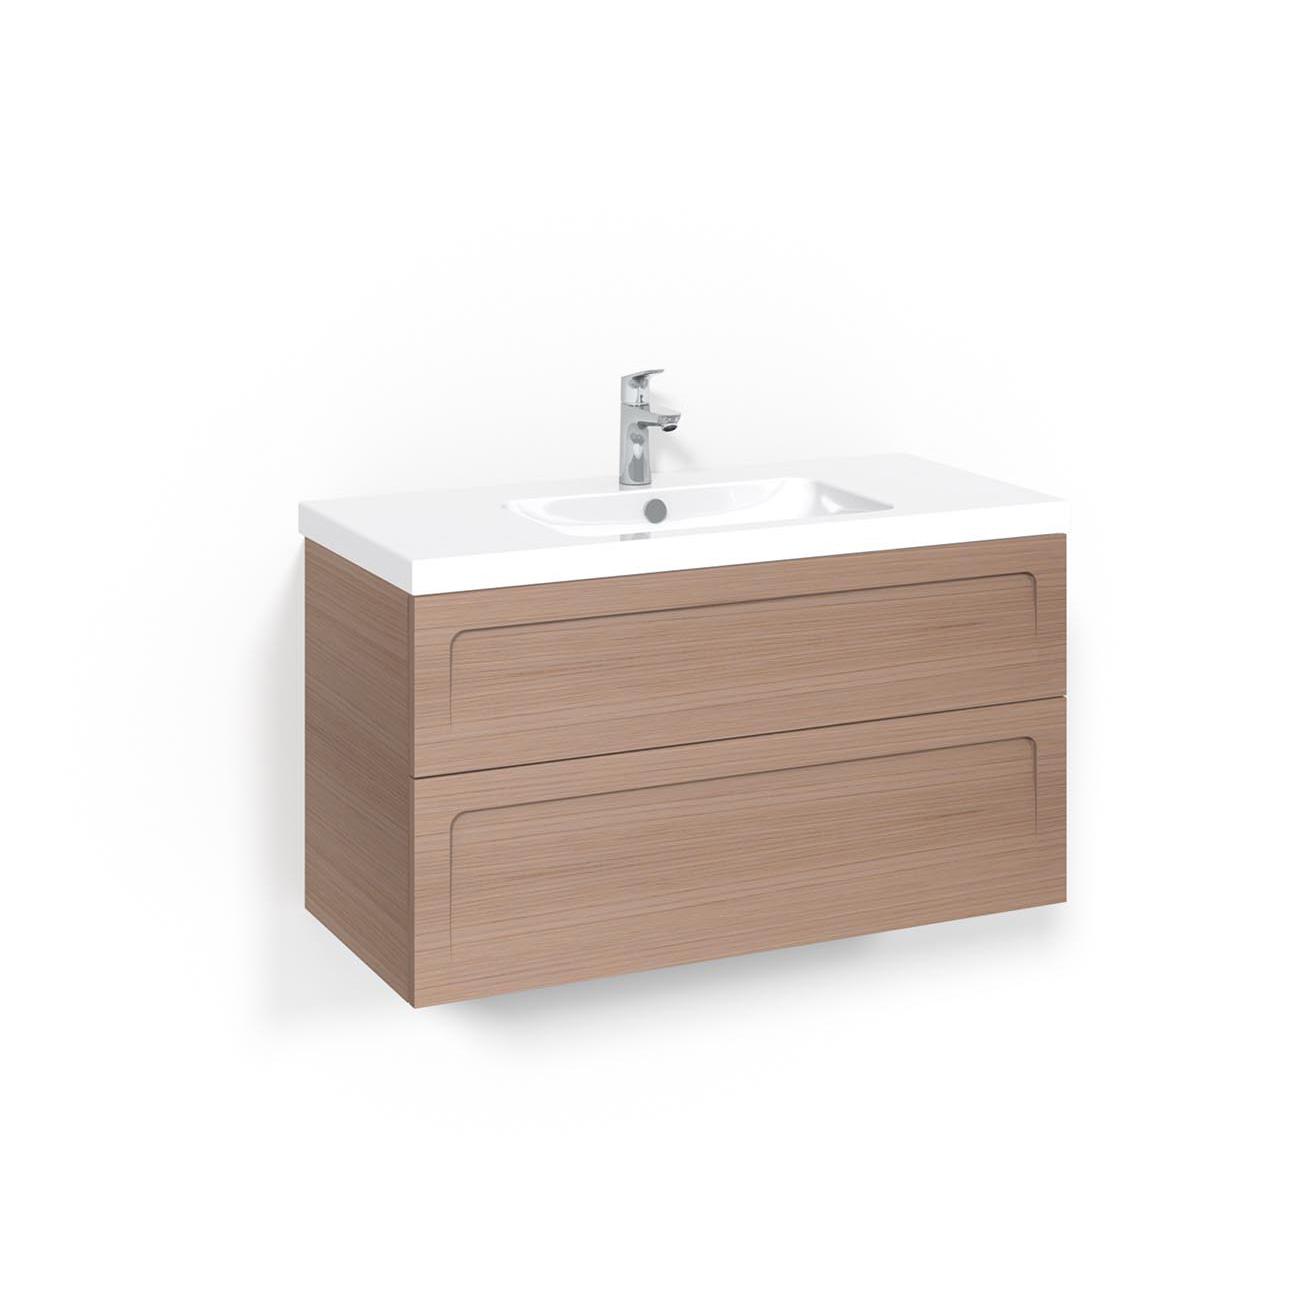 Tvättställsskåp Macro Design Crown Ramlucka Light 45